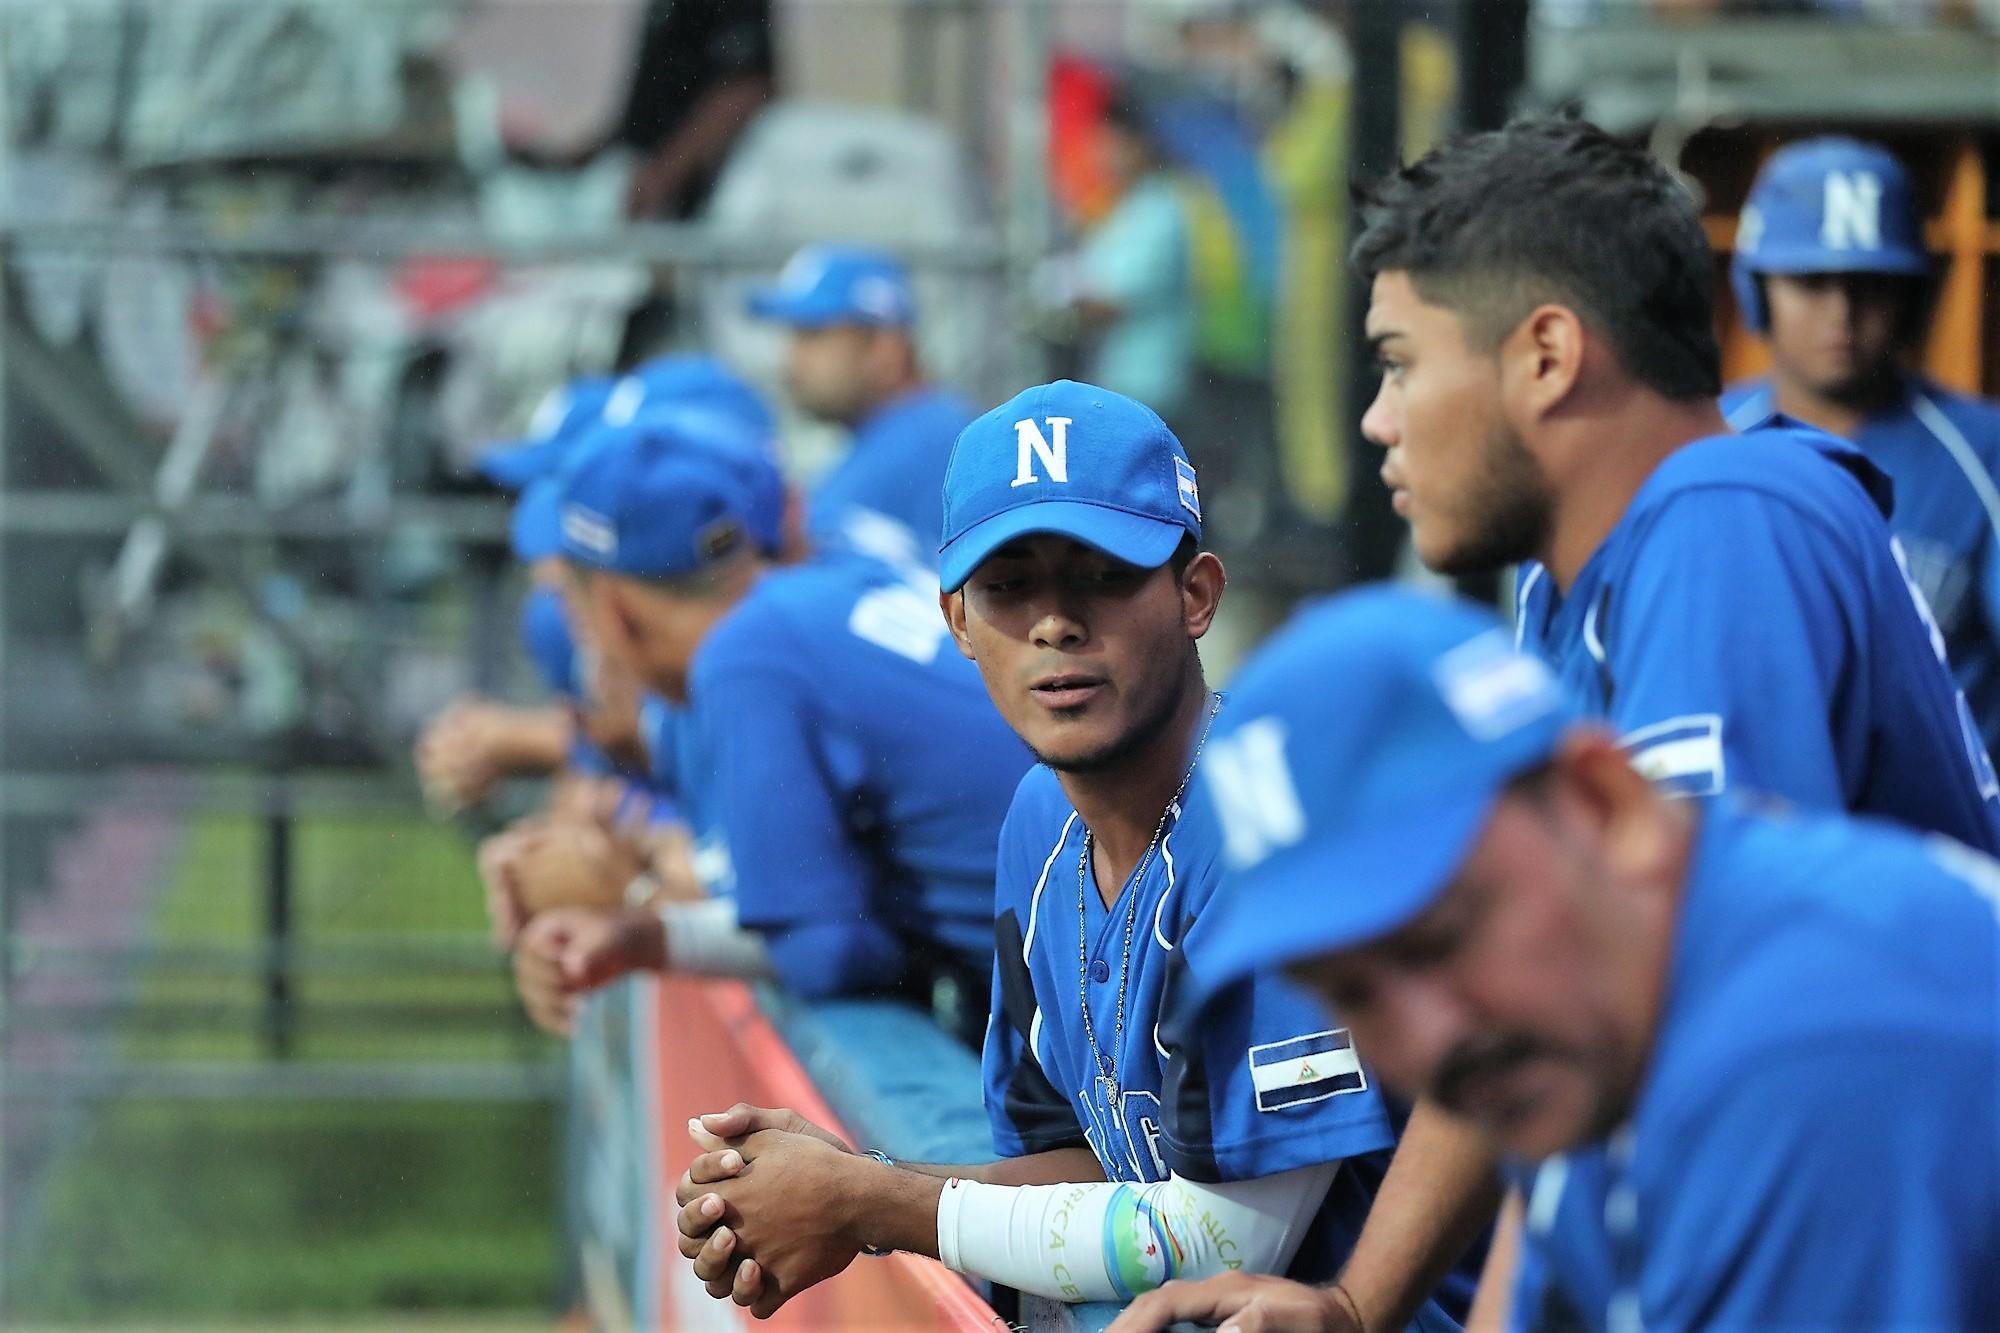 Nicaragua shared Korea's record